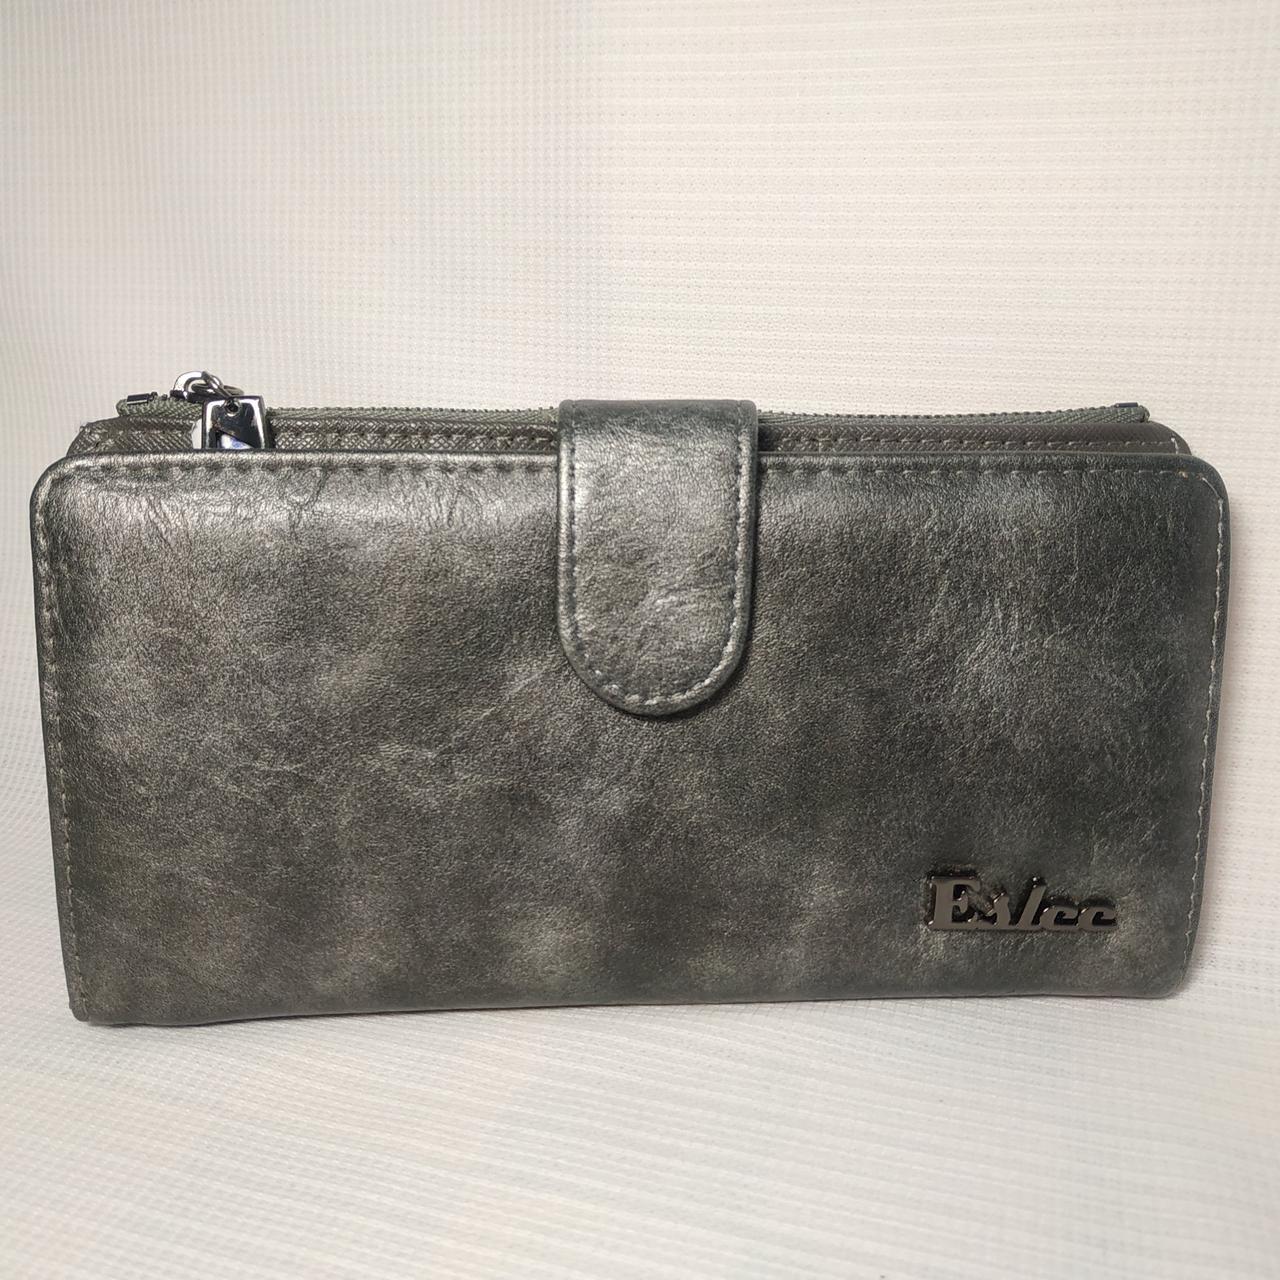 Класичний жіночий гаманець / Классический женский кошелек DS-PU-0001